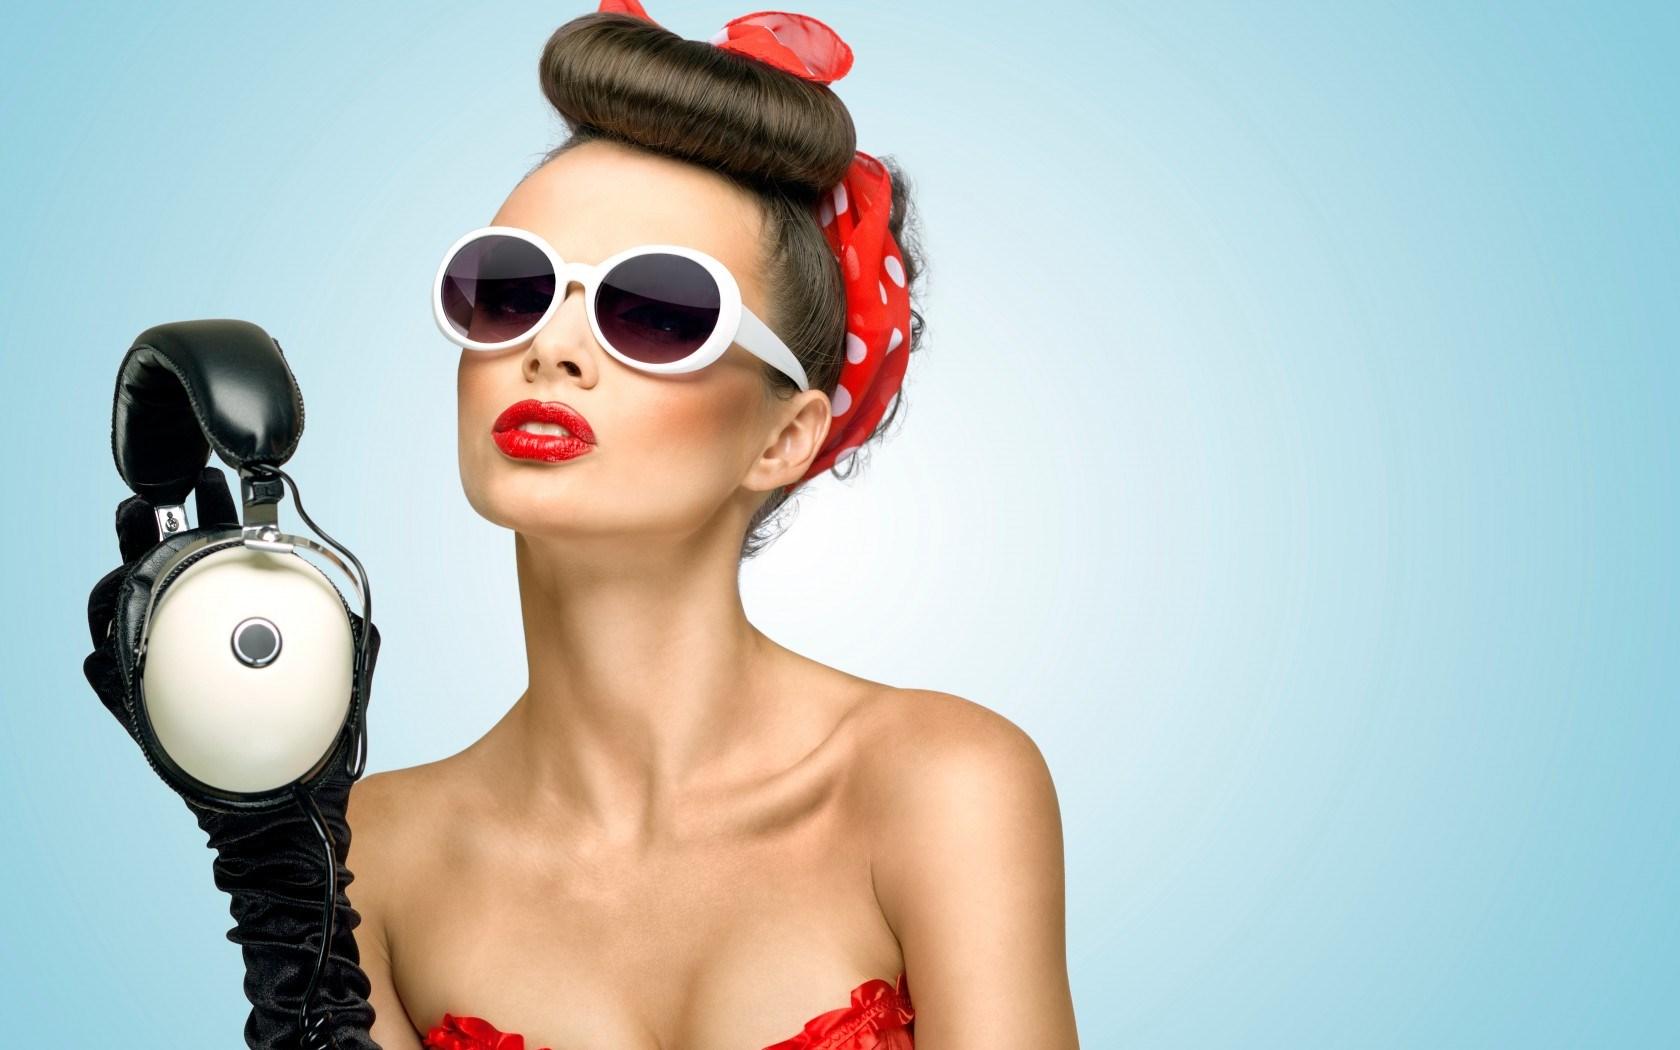 retro-girl-sunglasses-gloves-bow-headphones-hd-wallpaper